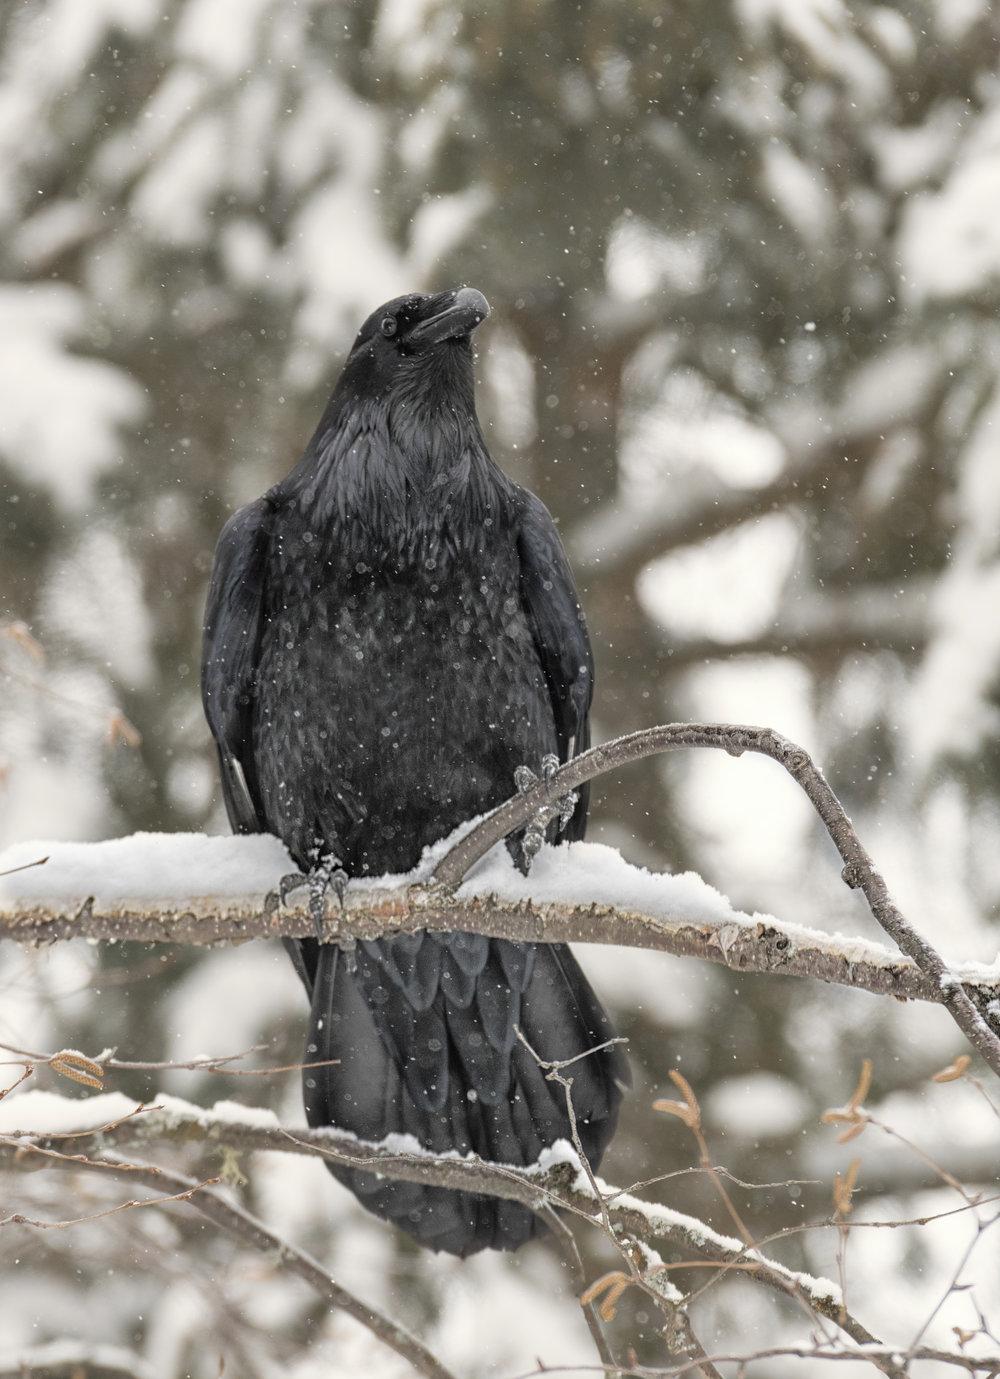 snowy raven.jpg